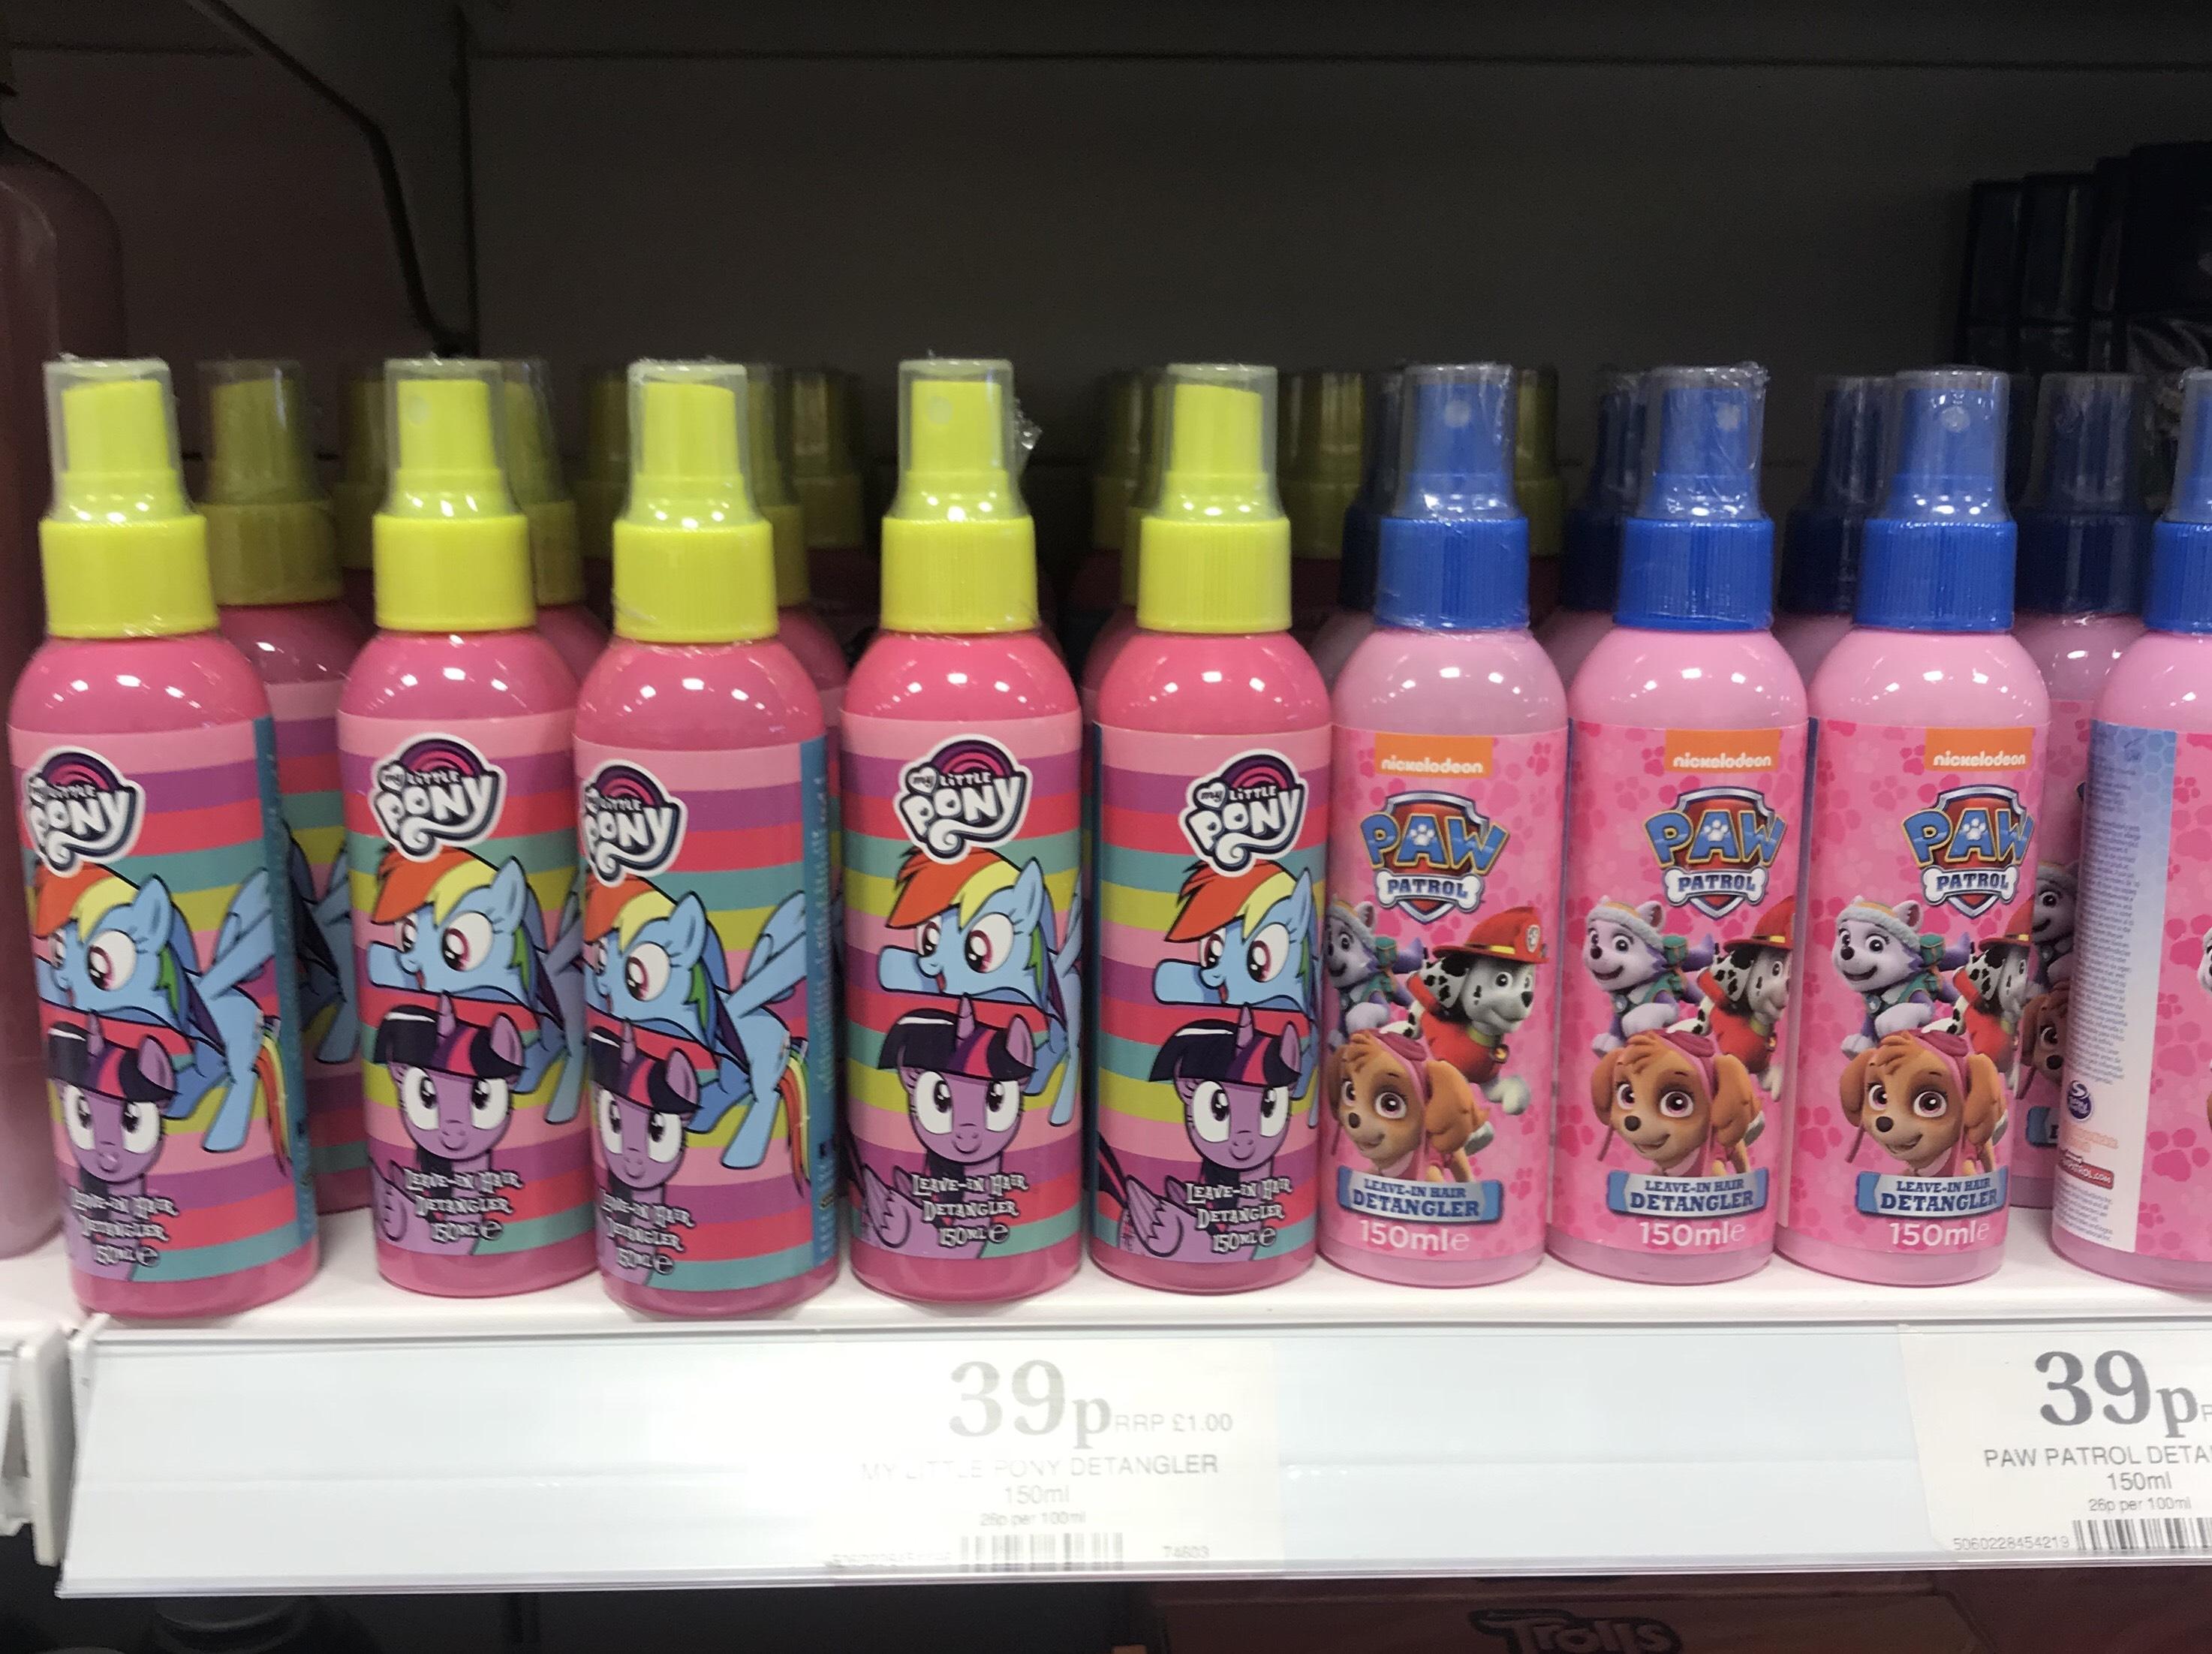 Kids my little pony/paw patrol detangle spray 39p @ Home Bargains